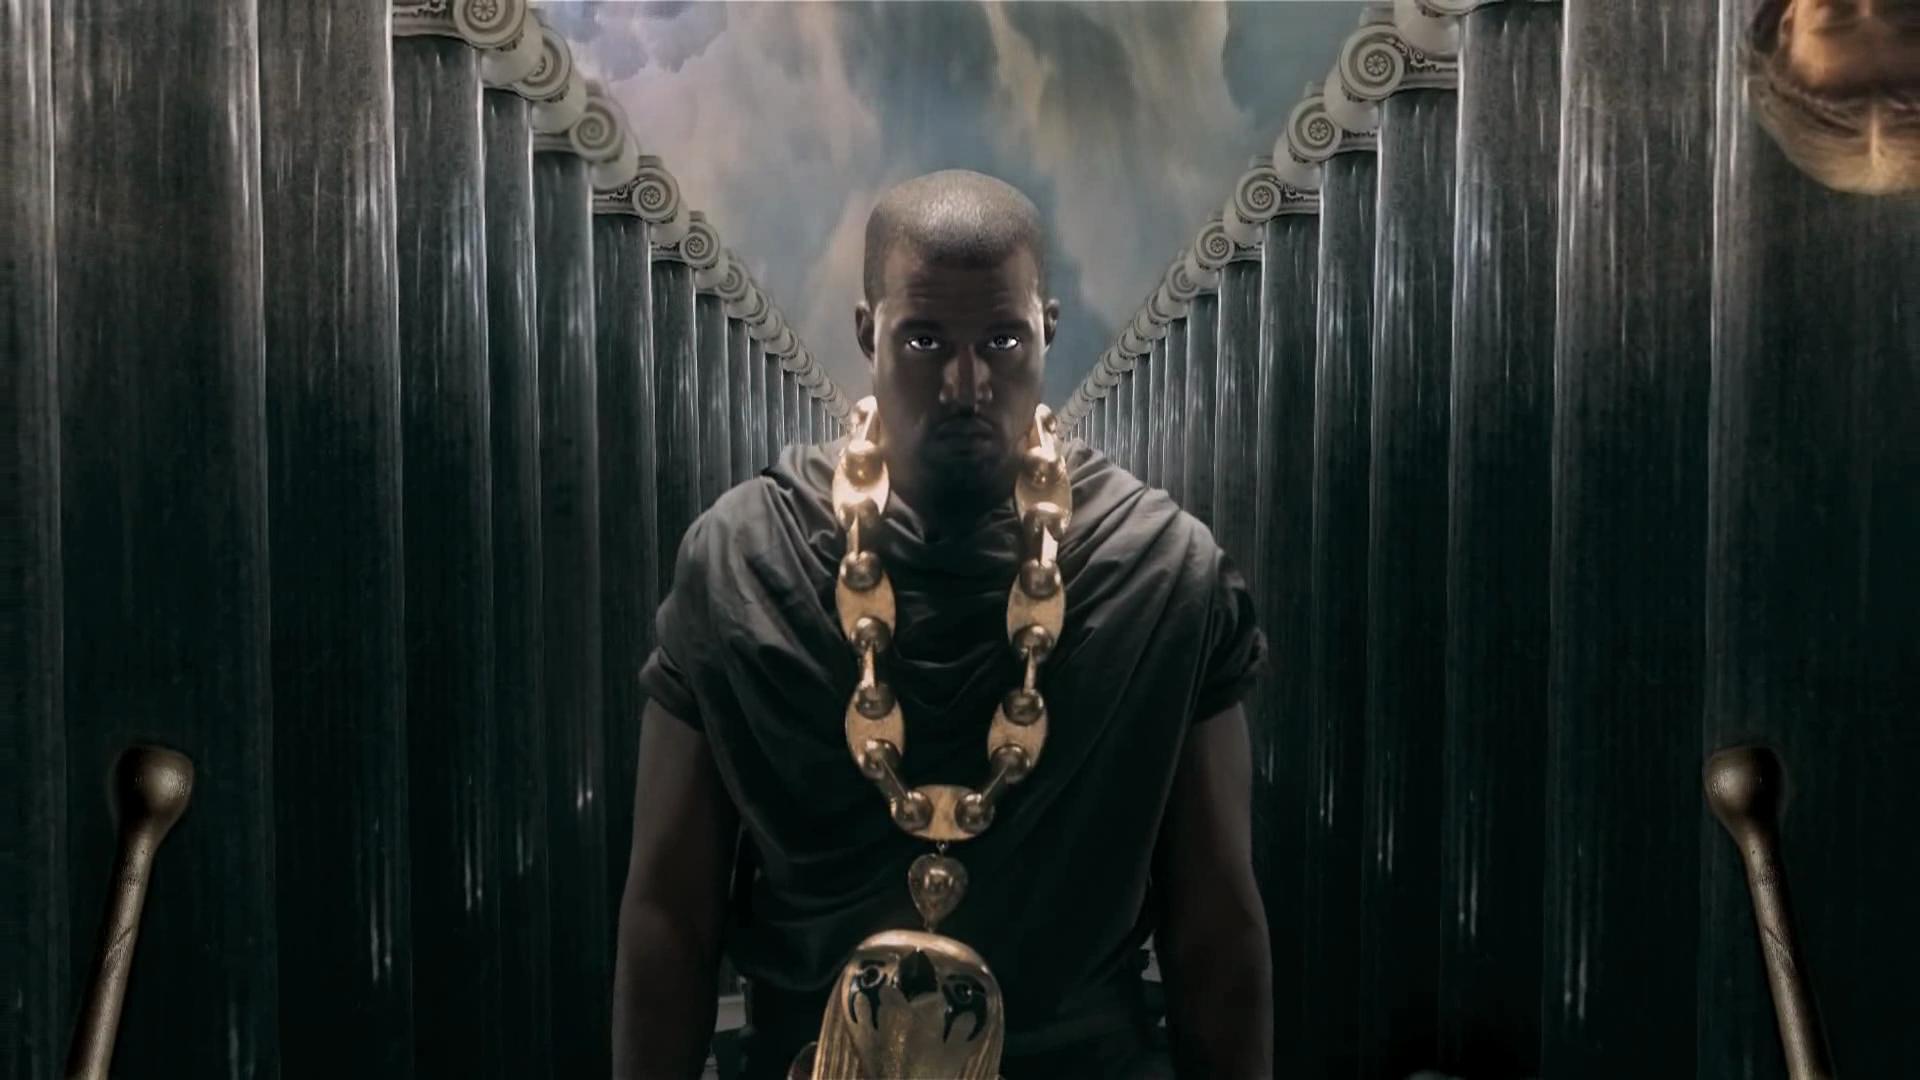 Kanye West Wallpapers - WallpaperSafari Kanye West Power Wallpaper